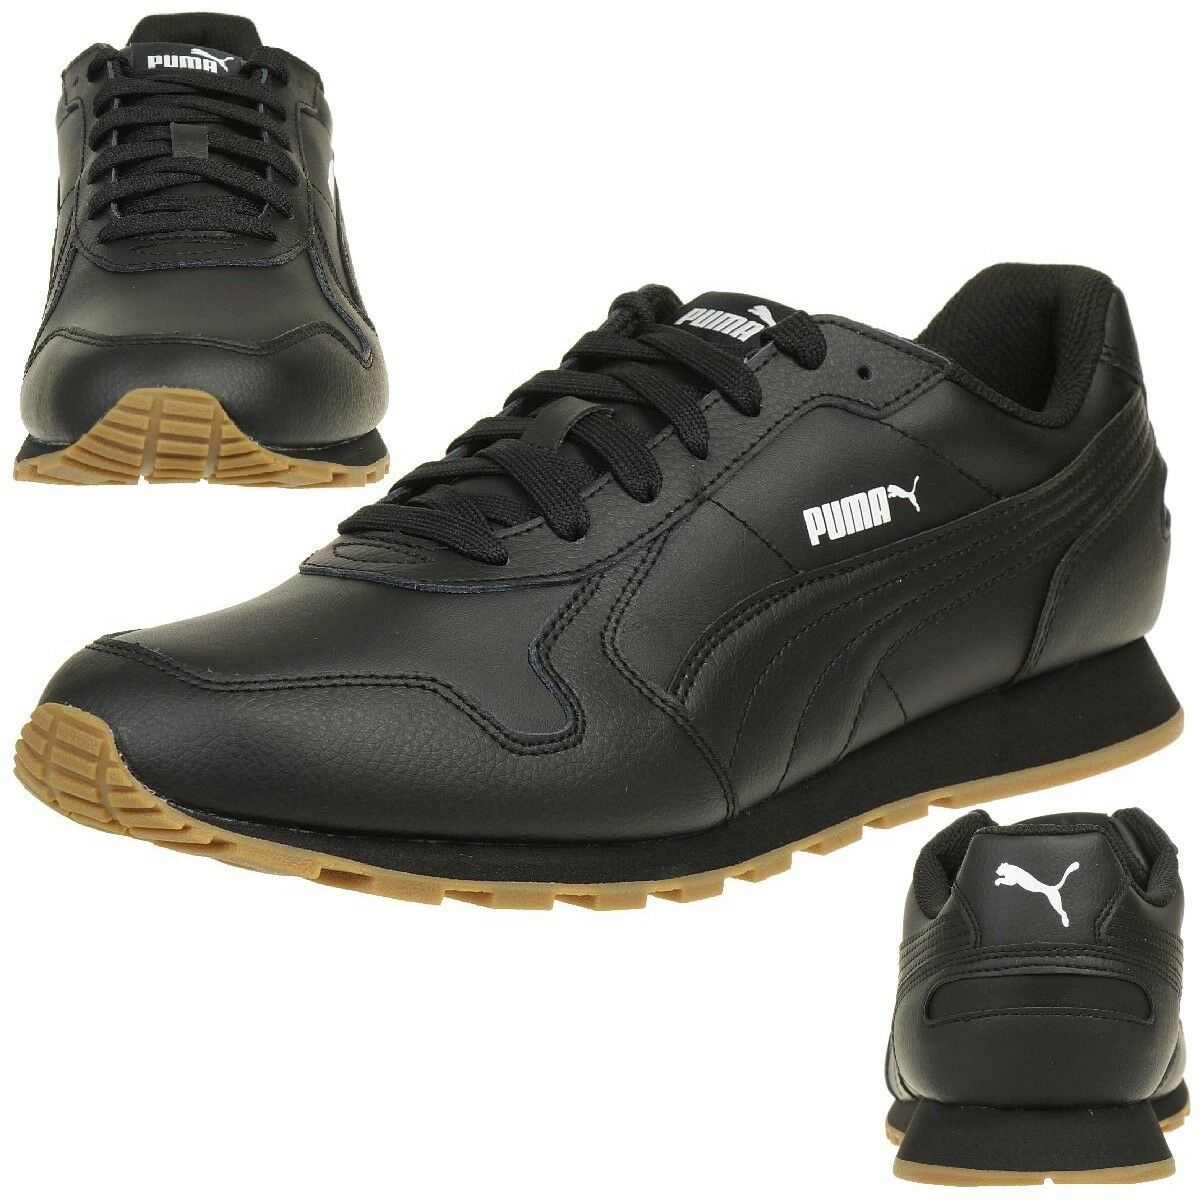 Puma St Corredor Lleno L Negro Zapatillas Deportivas Zapatos Hombre Negro L 359130 08 e514f9